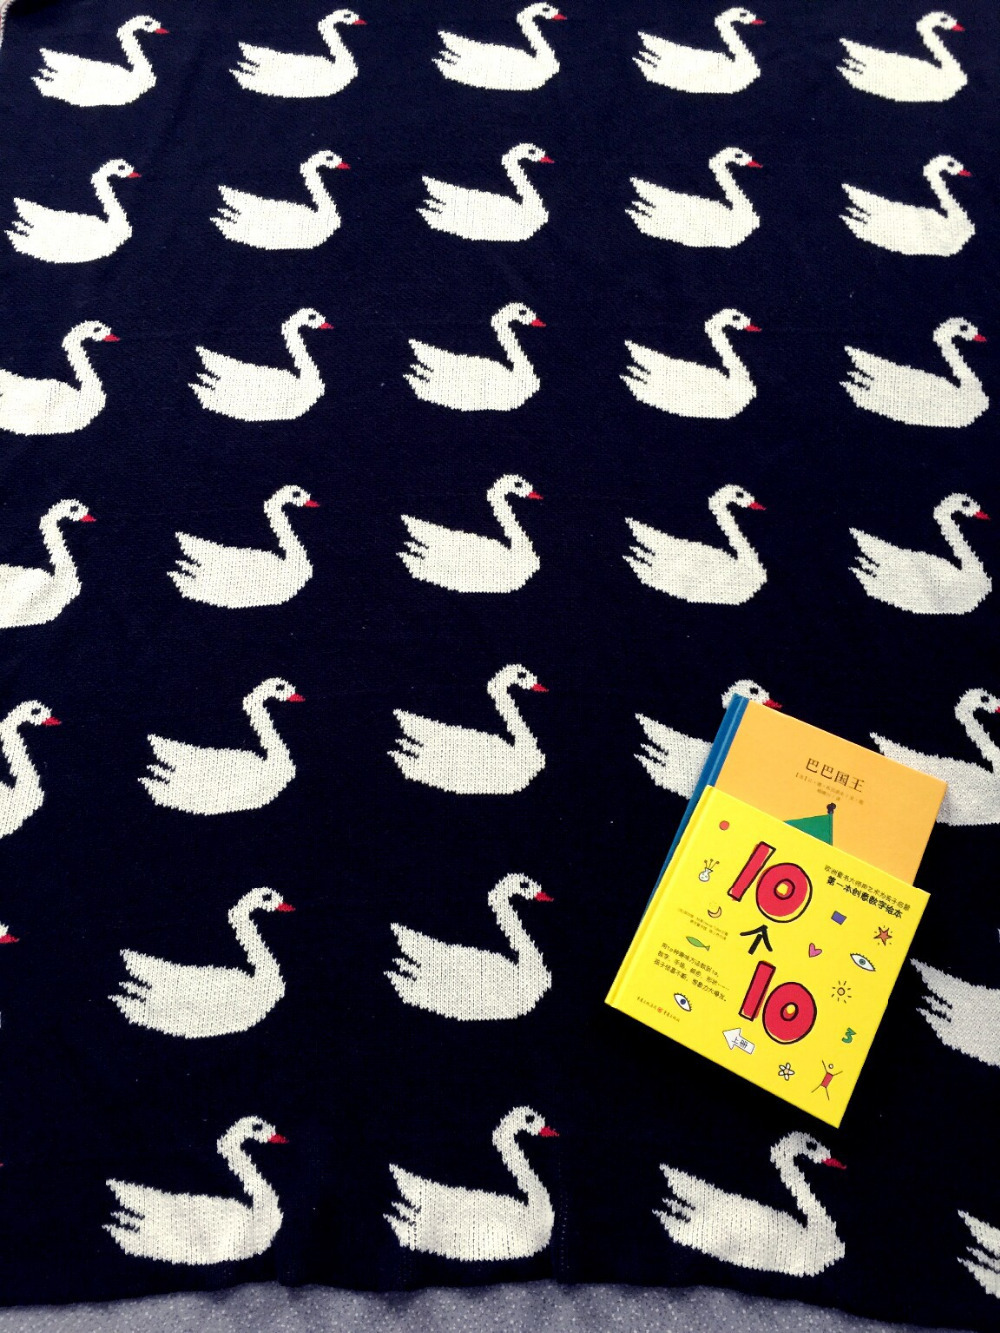 online get cheap black modern crib aliexpresscom  alibaba group -  new ins hot sales brand cotton child baby knitted blanket black whitecross swan cat rabbit cartoon crib bed throw blanket